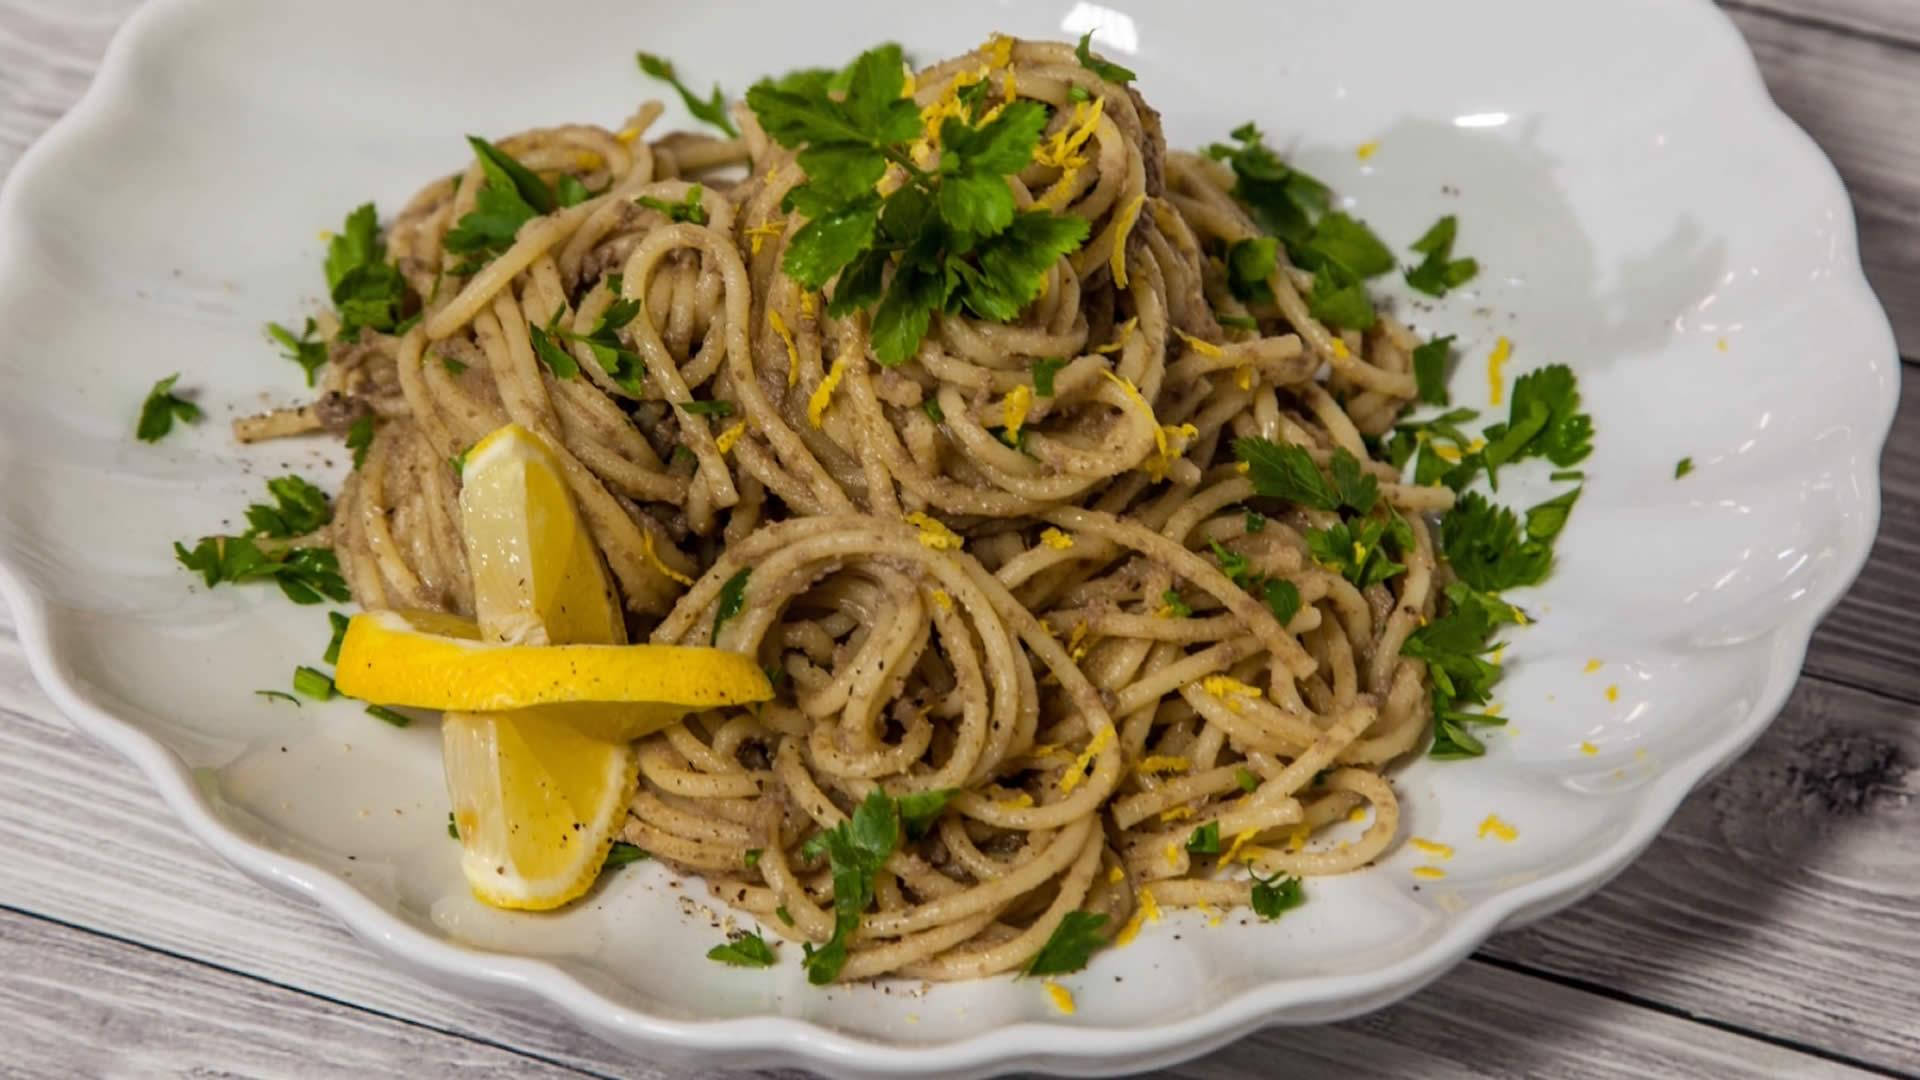 sarde in saor pasta con pasta con le sarde pasta with pasta con le ...